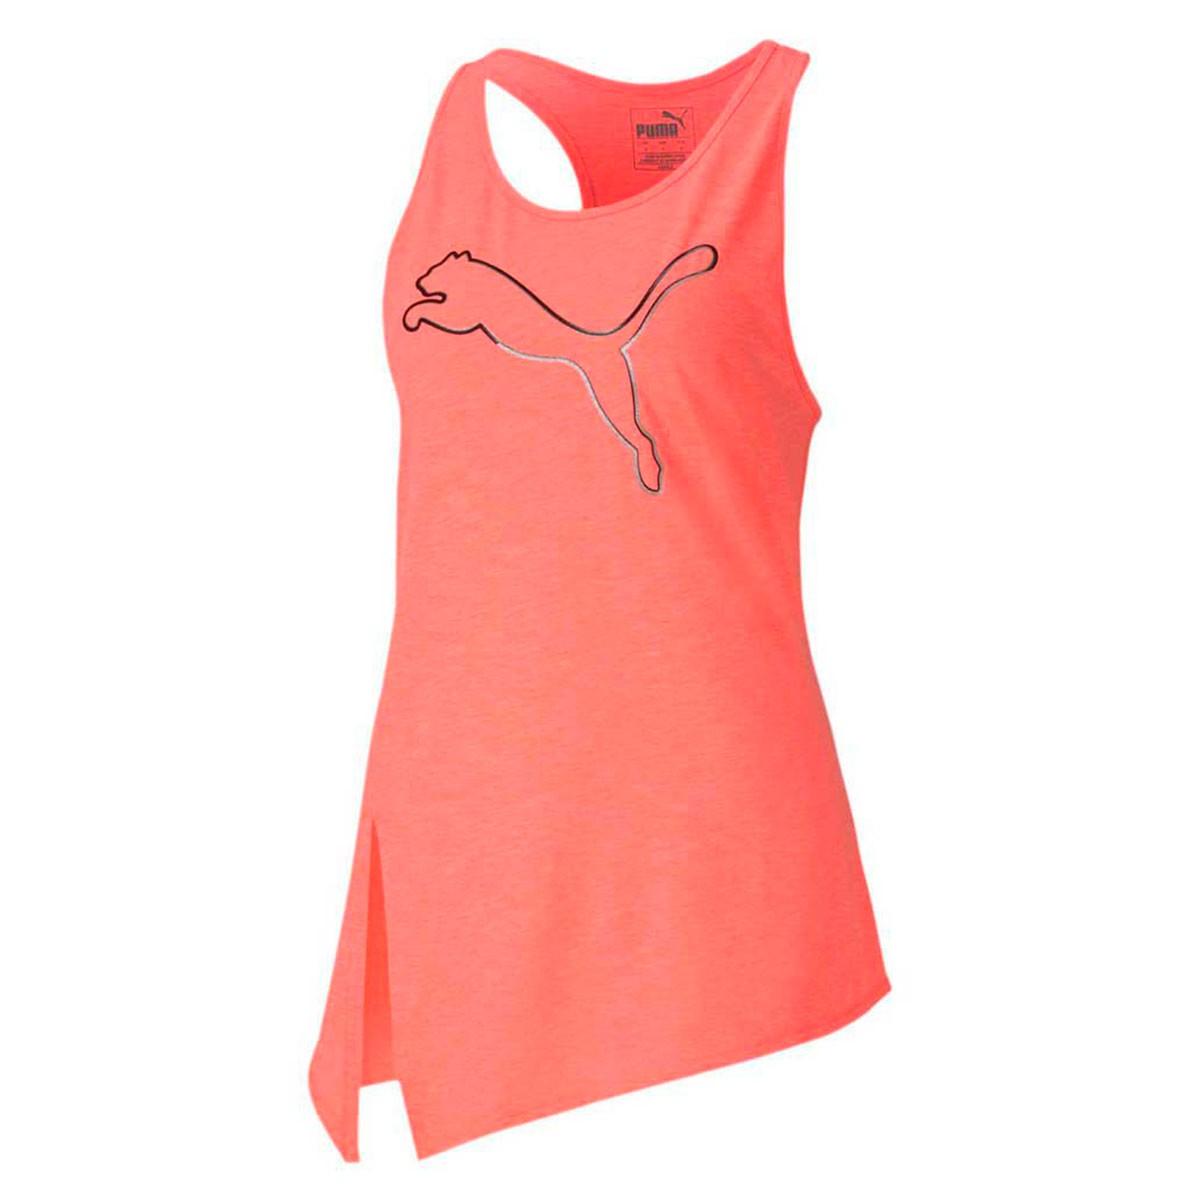 Camiseta Puma Logo Tie Tank Feminina